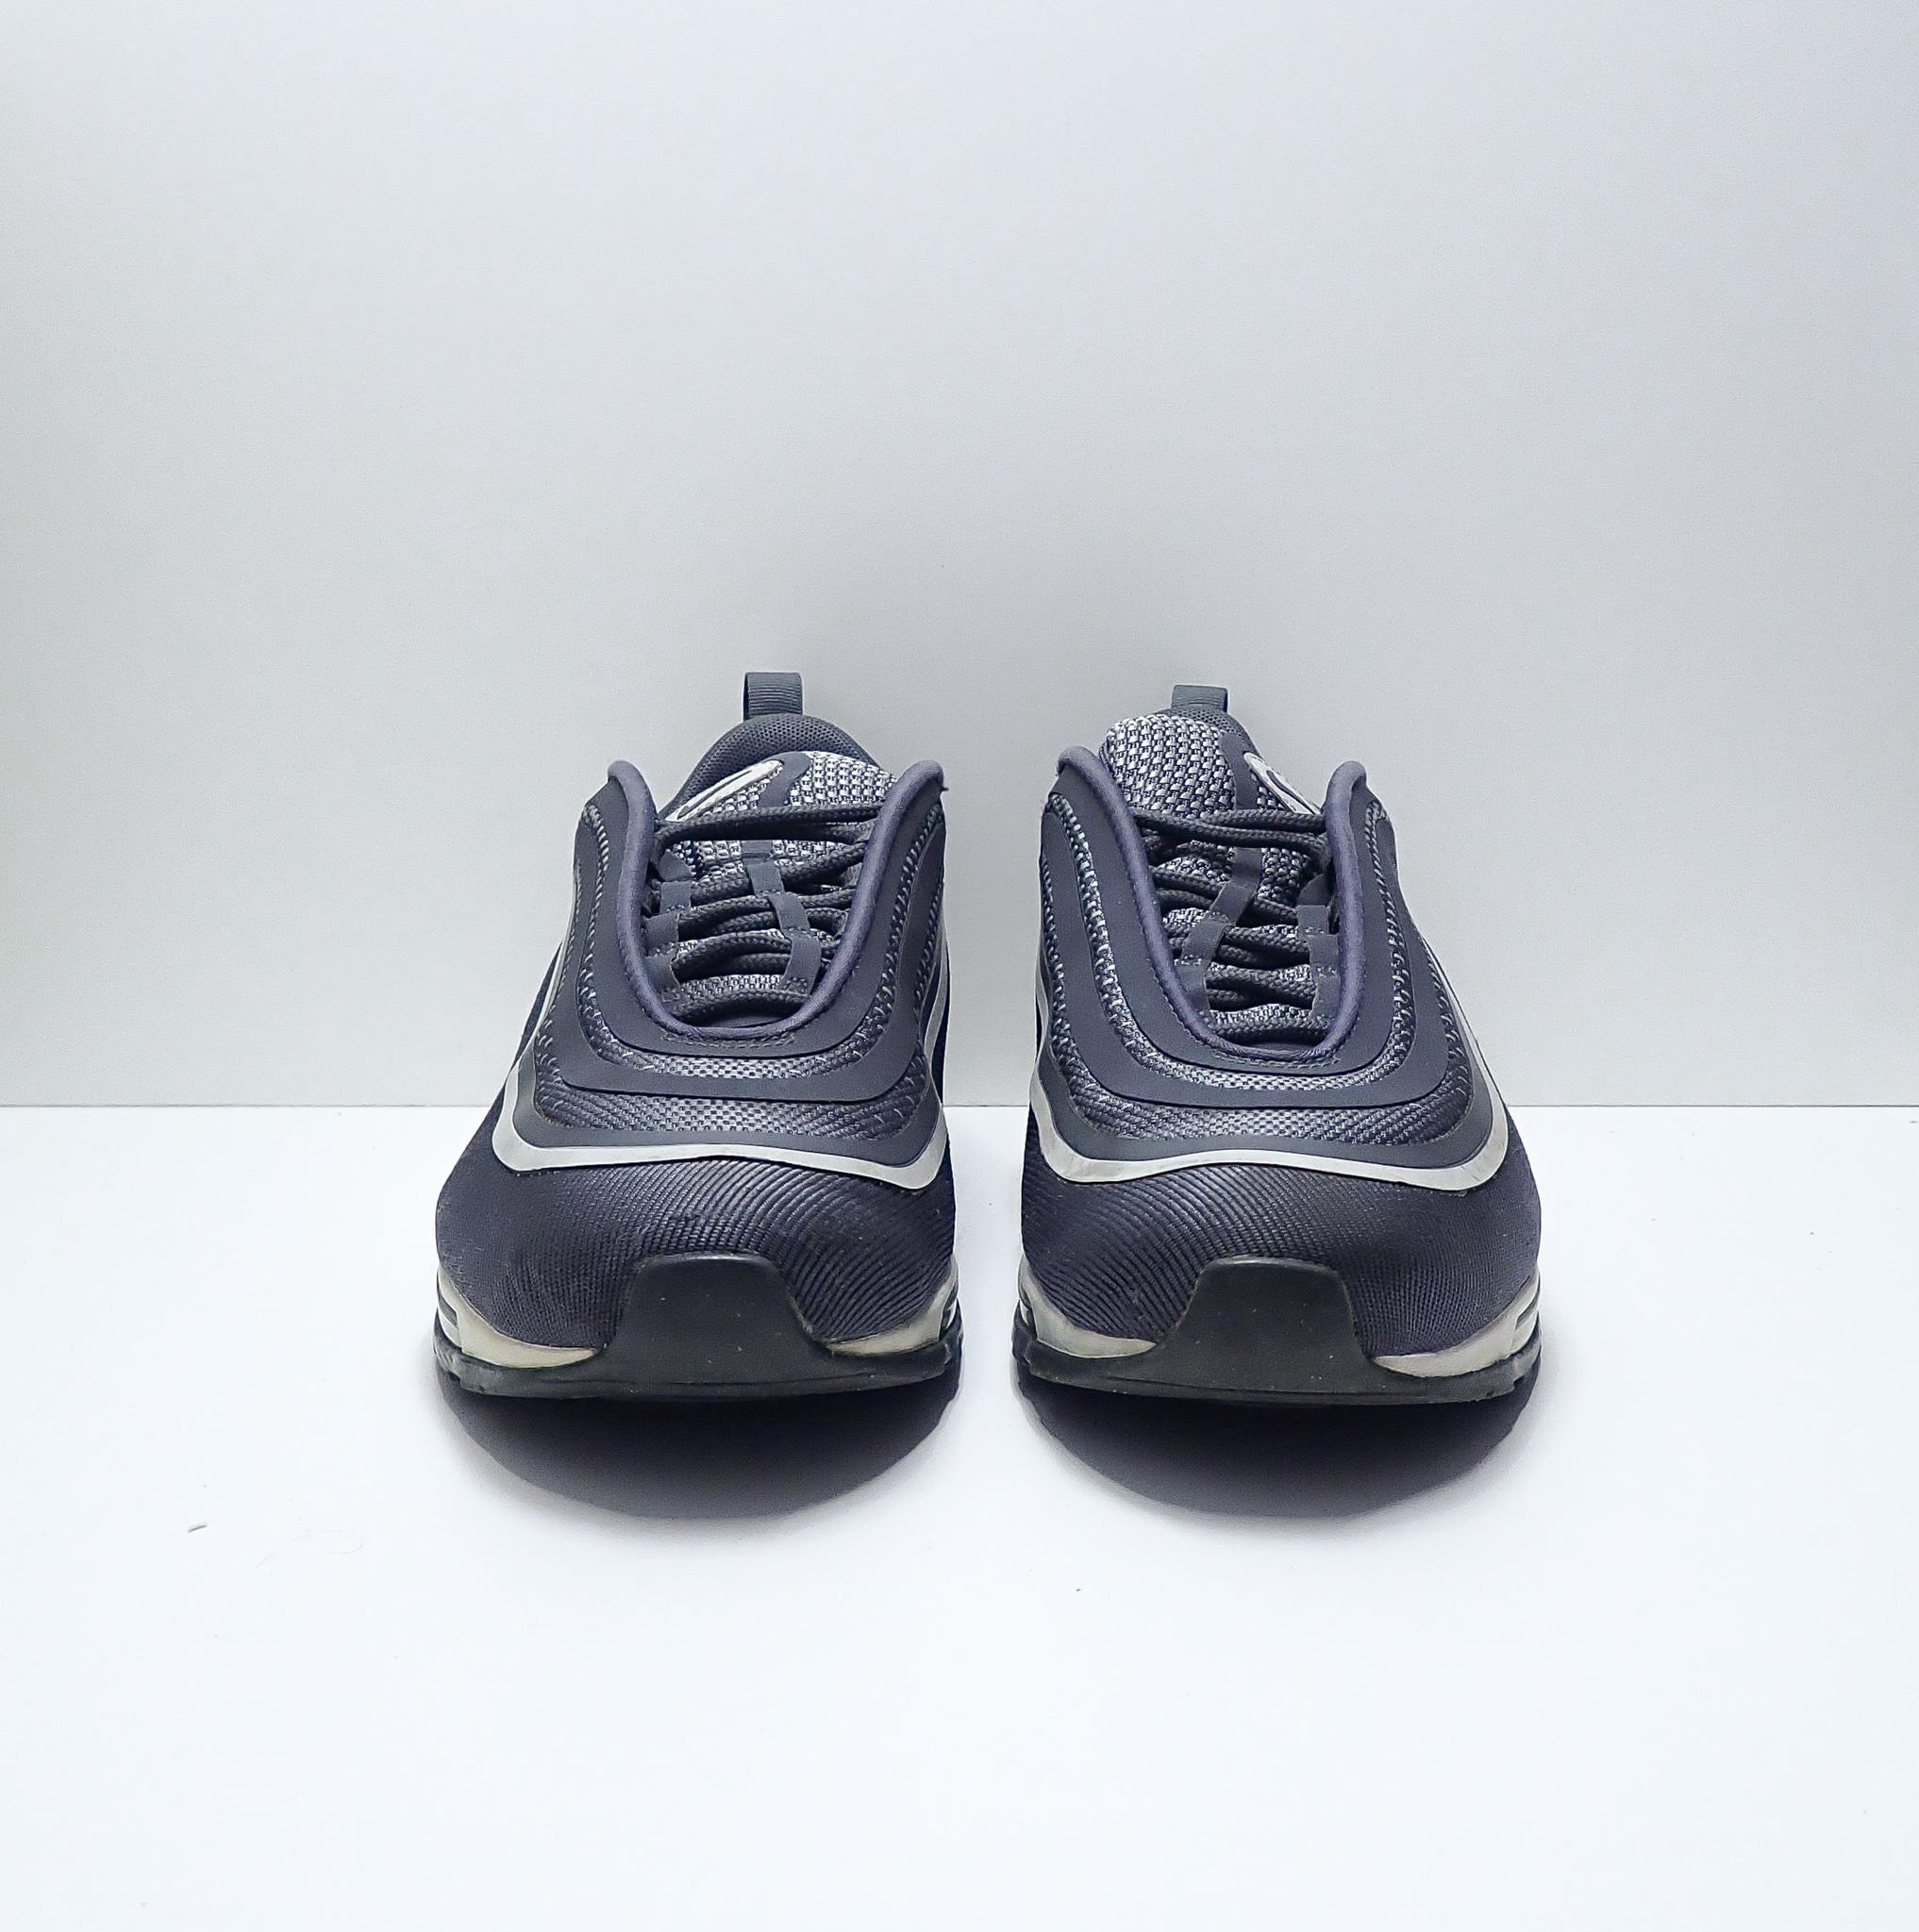 Nike Air Max 97 Ultra 17 Pure Platinum